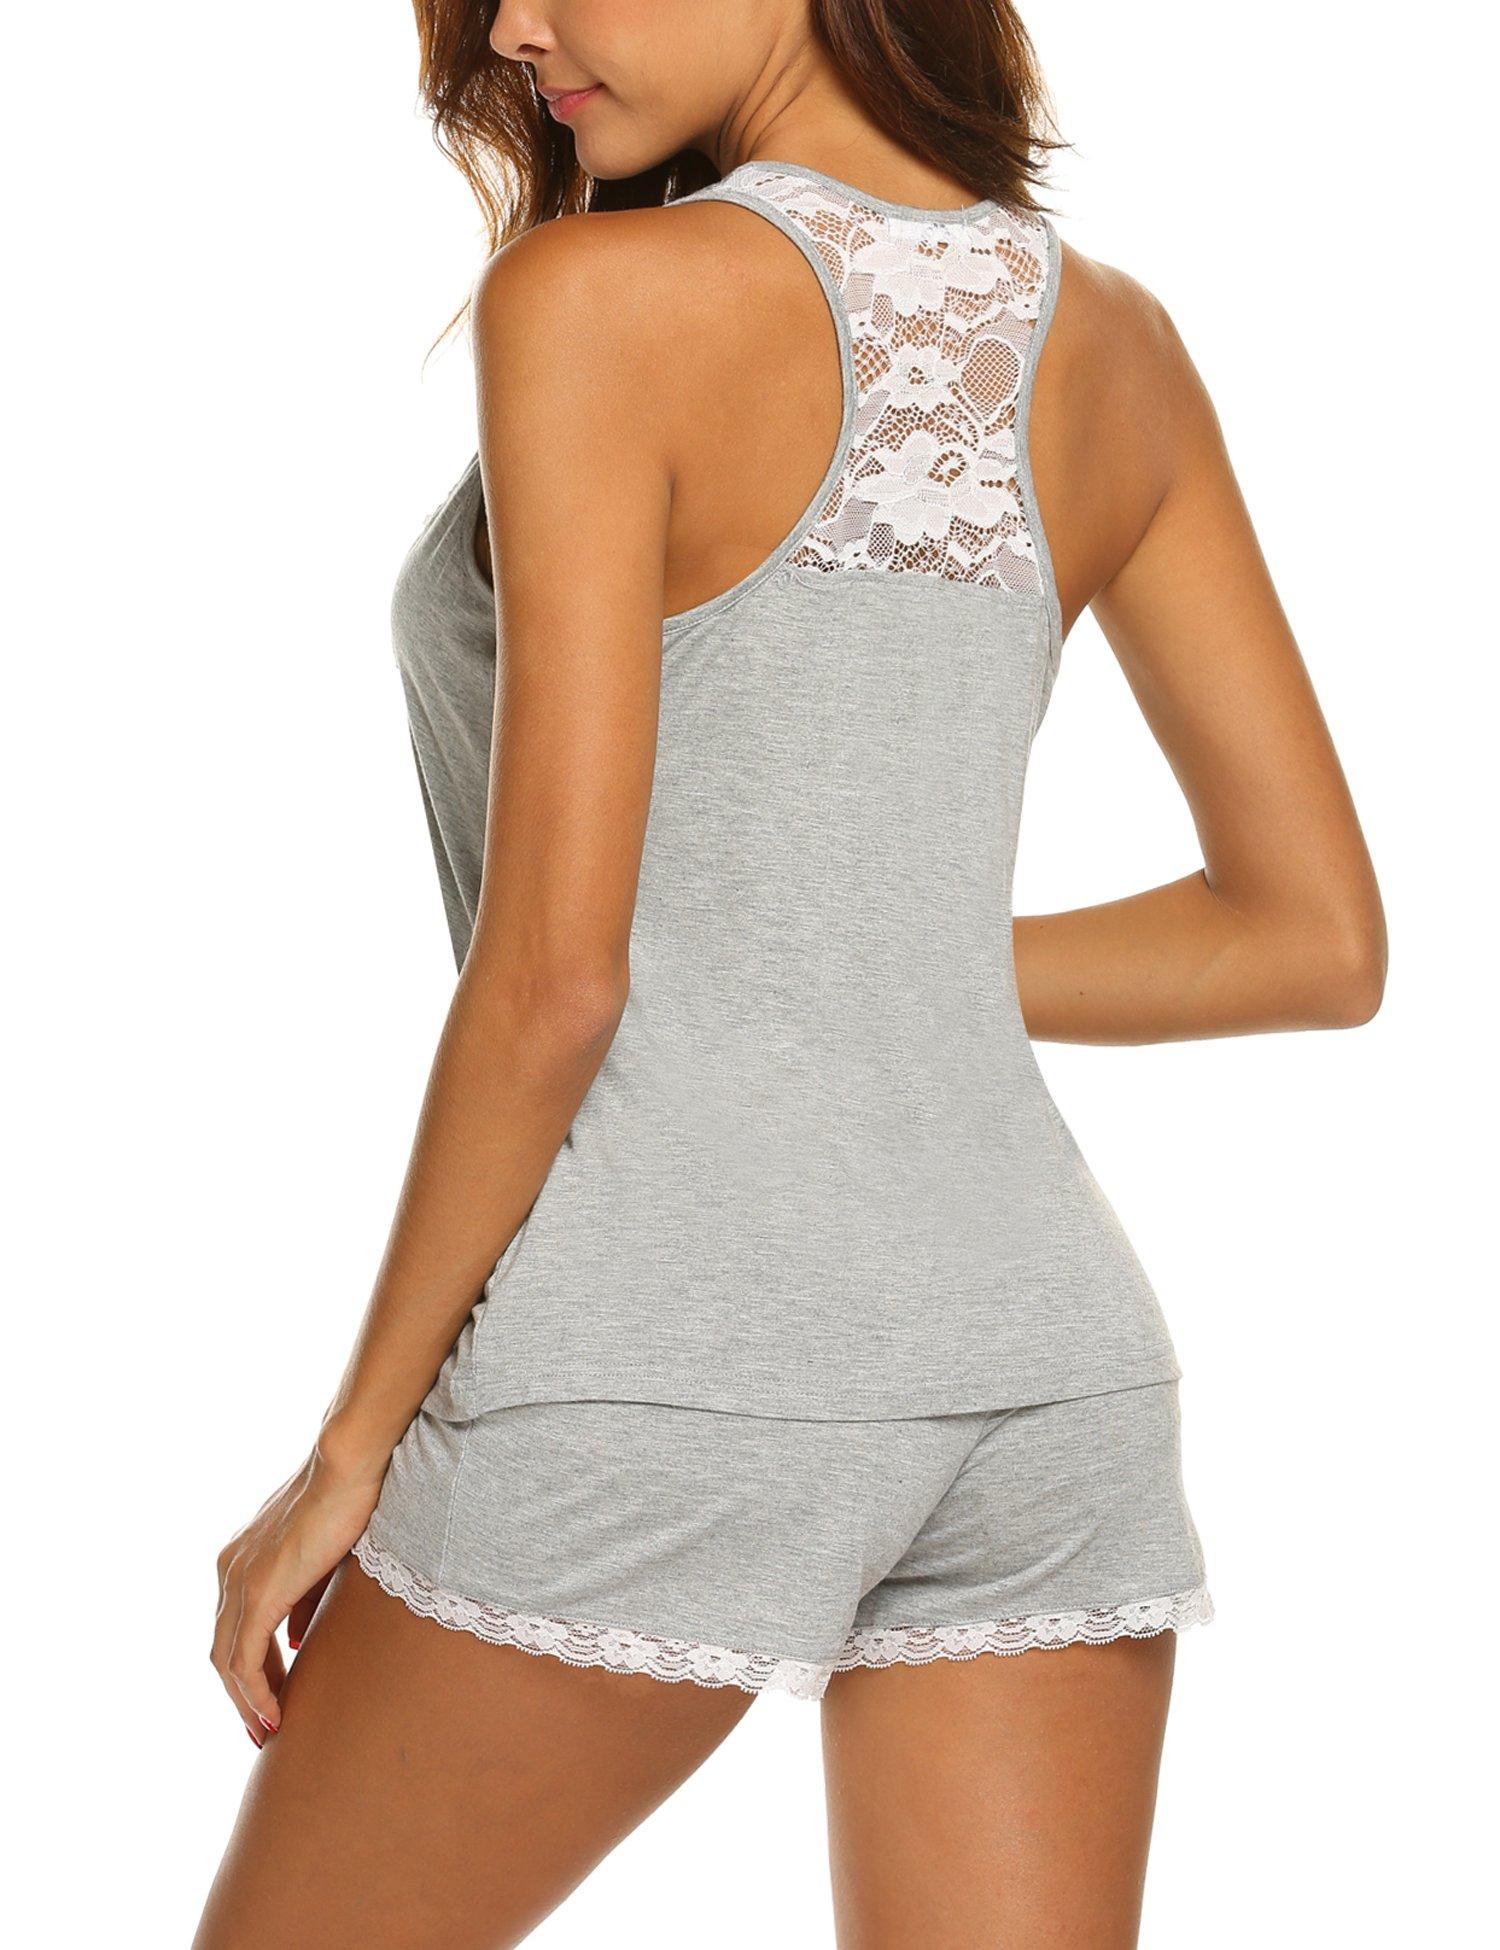 MAXMODA Women\'s Lace Sexy Pajama Set Sleeveless PJ Tank and Shorts Sleepwear Heather Grey S